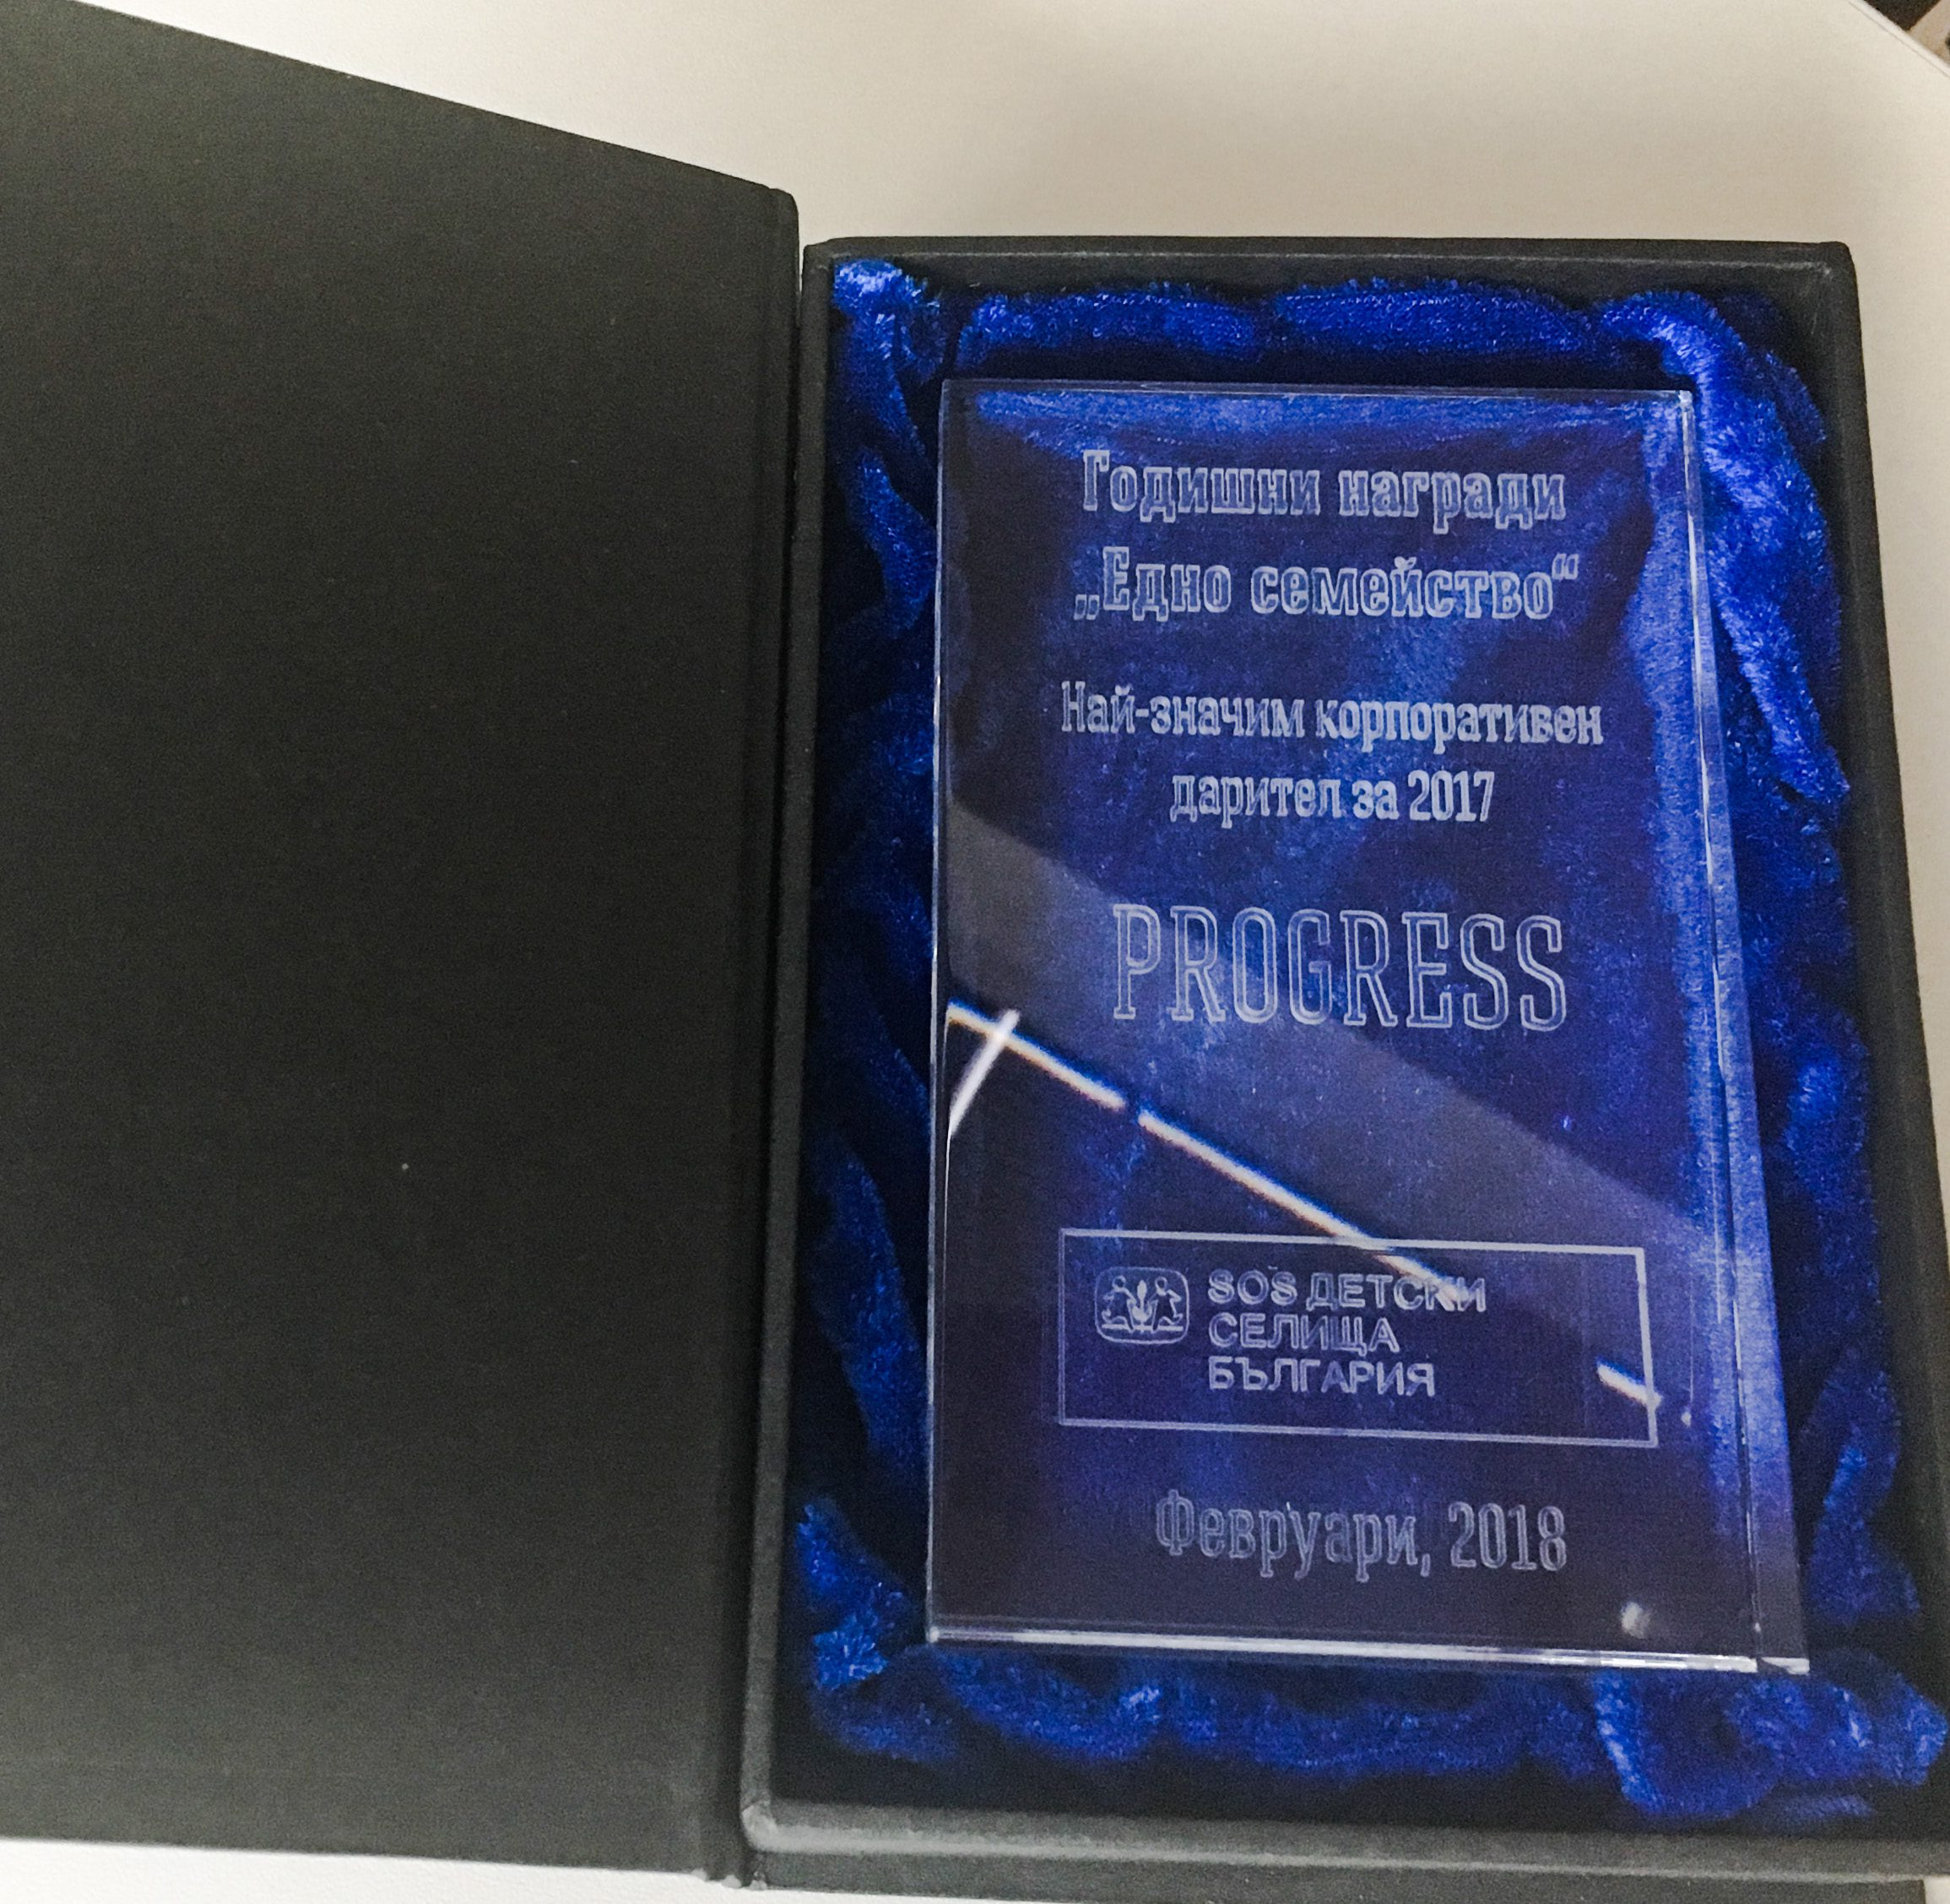 SOS Progress Award